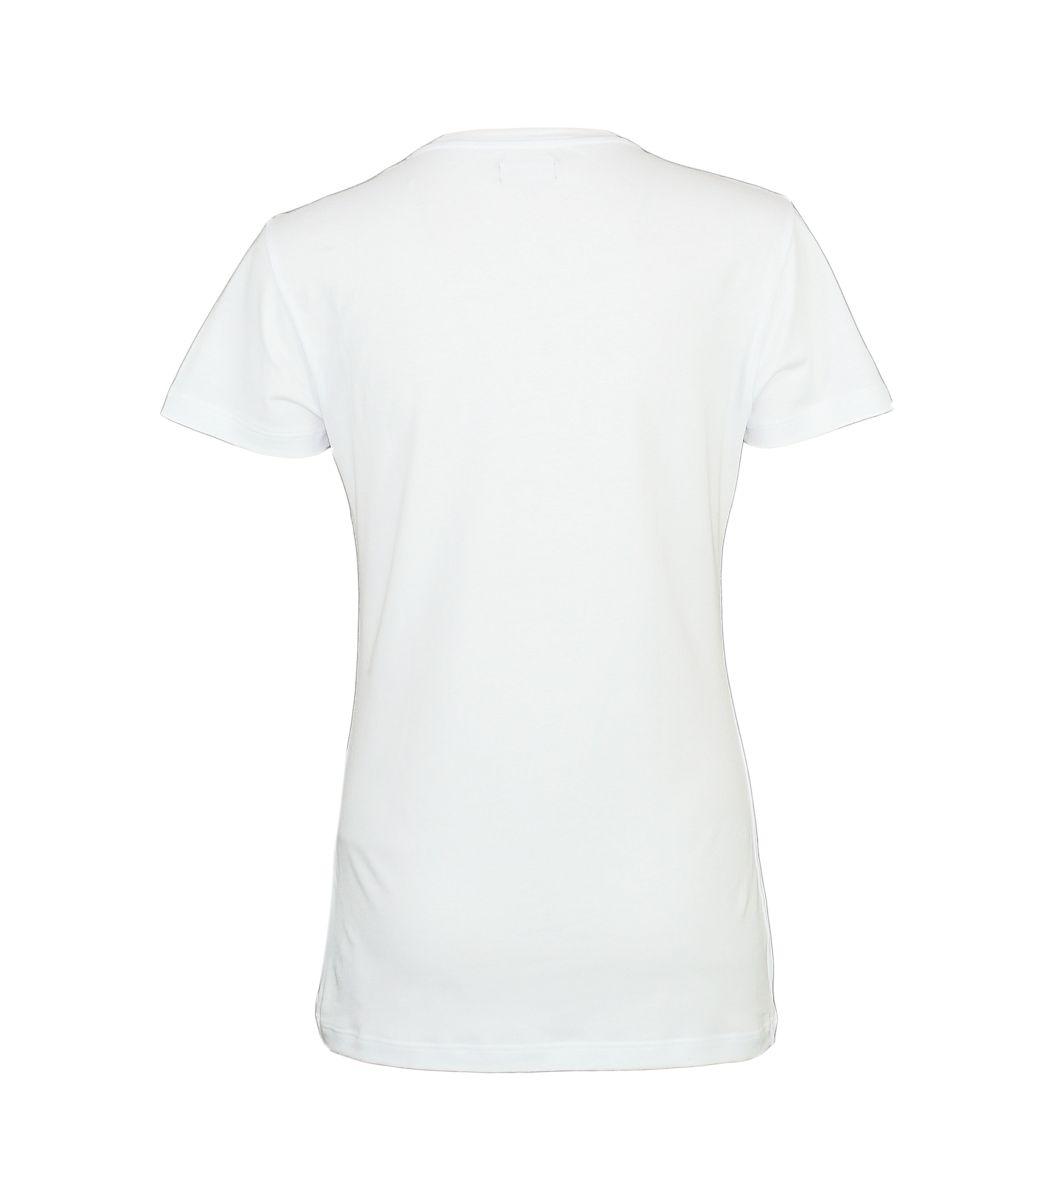 Emporio Armani Damen Shirt T-Shirt V-Ausschnitt 163321 7A263 00010 BIANCO HW17-EADS1